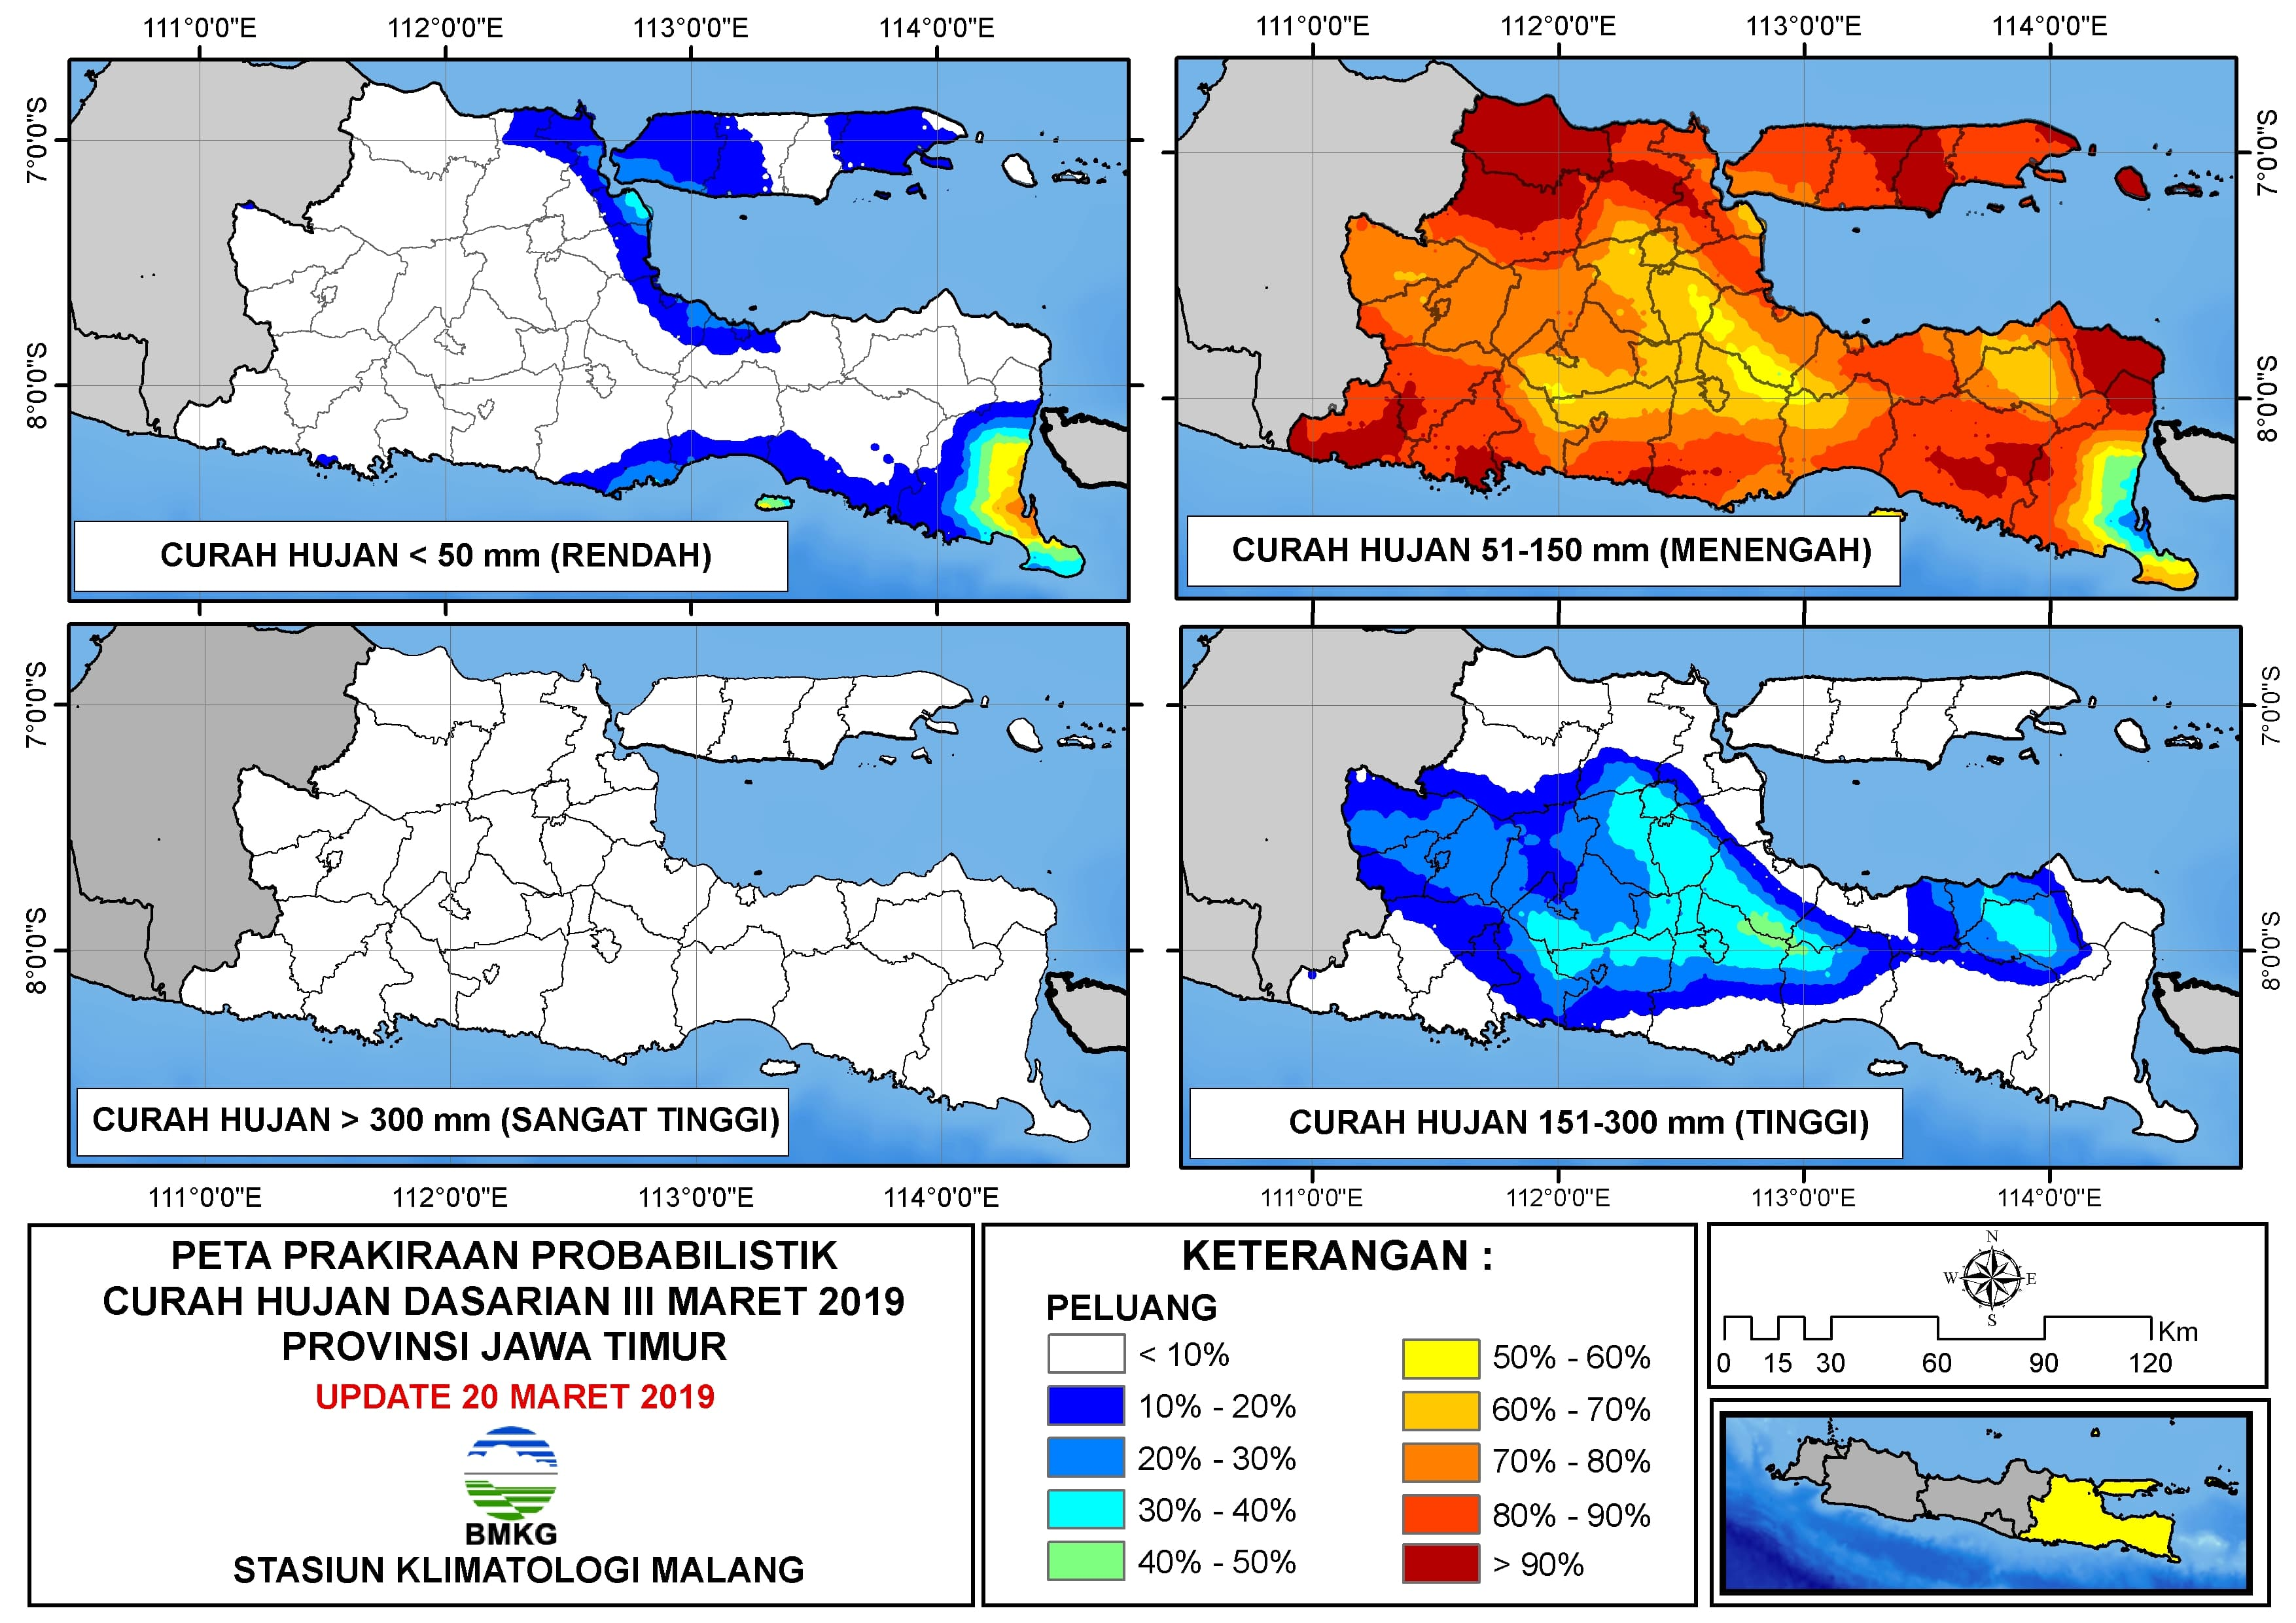 Peta Prakiraan Probabilistik Curah Hujan Dasarian III Provinsi Jawa Timur Update 20 Maret 2019